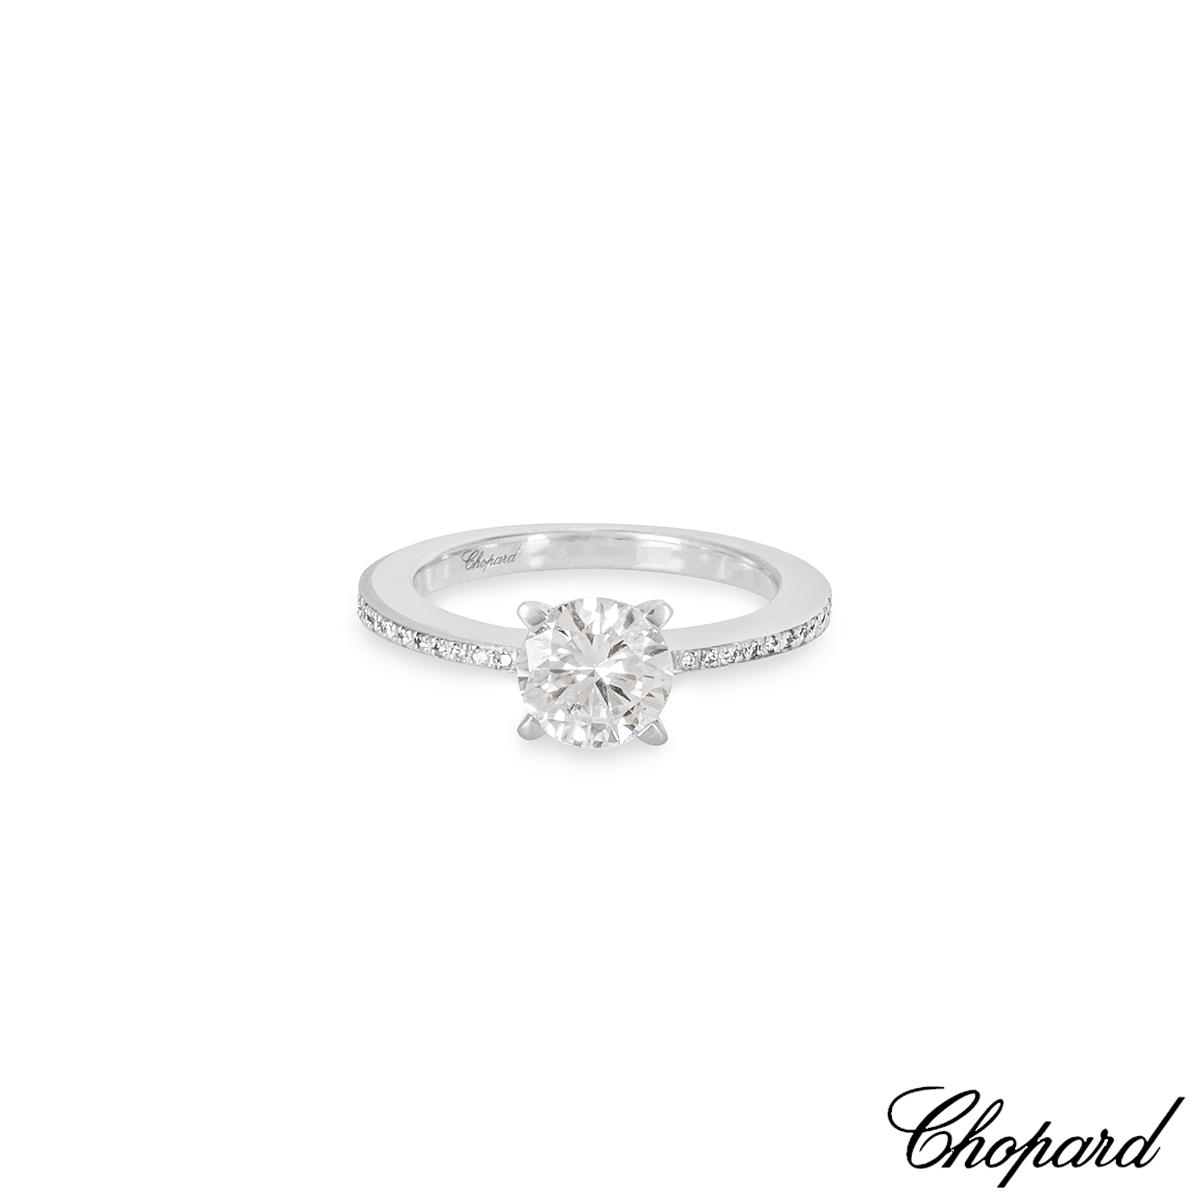 Chopard White Gold Diamond Ring 1.01ct D/VS2